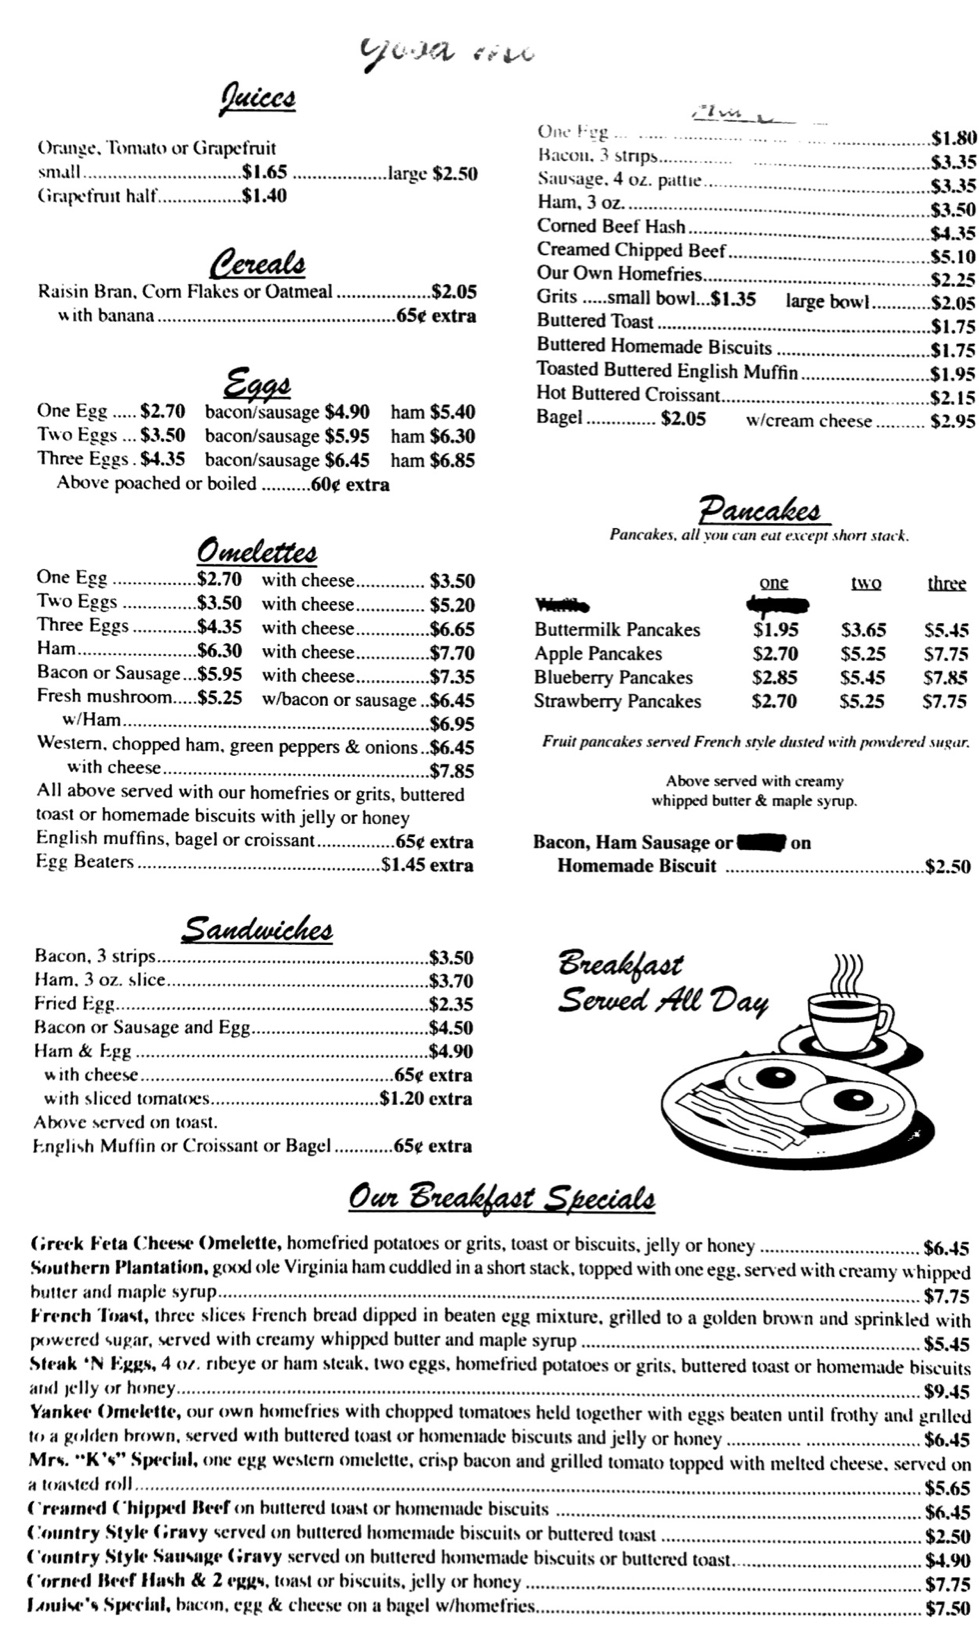 Yankee Coffee Shop's menu, page 4.